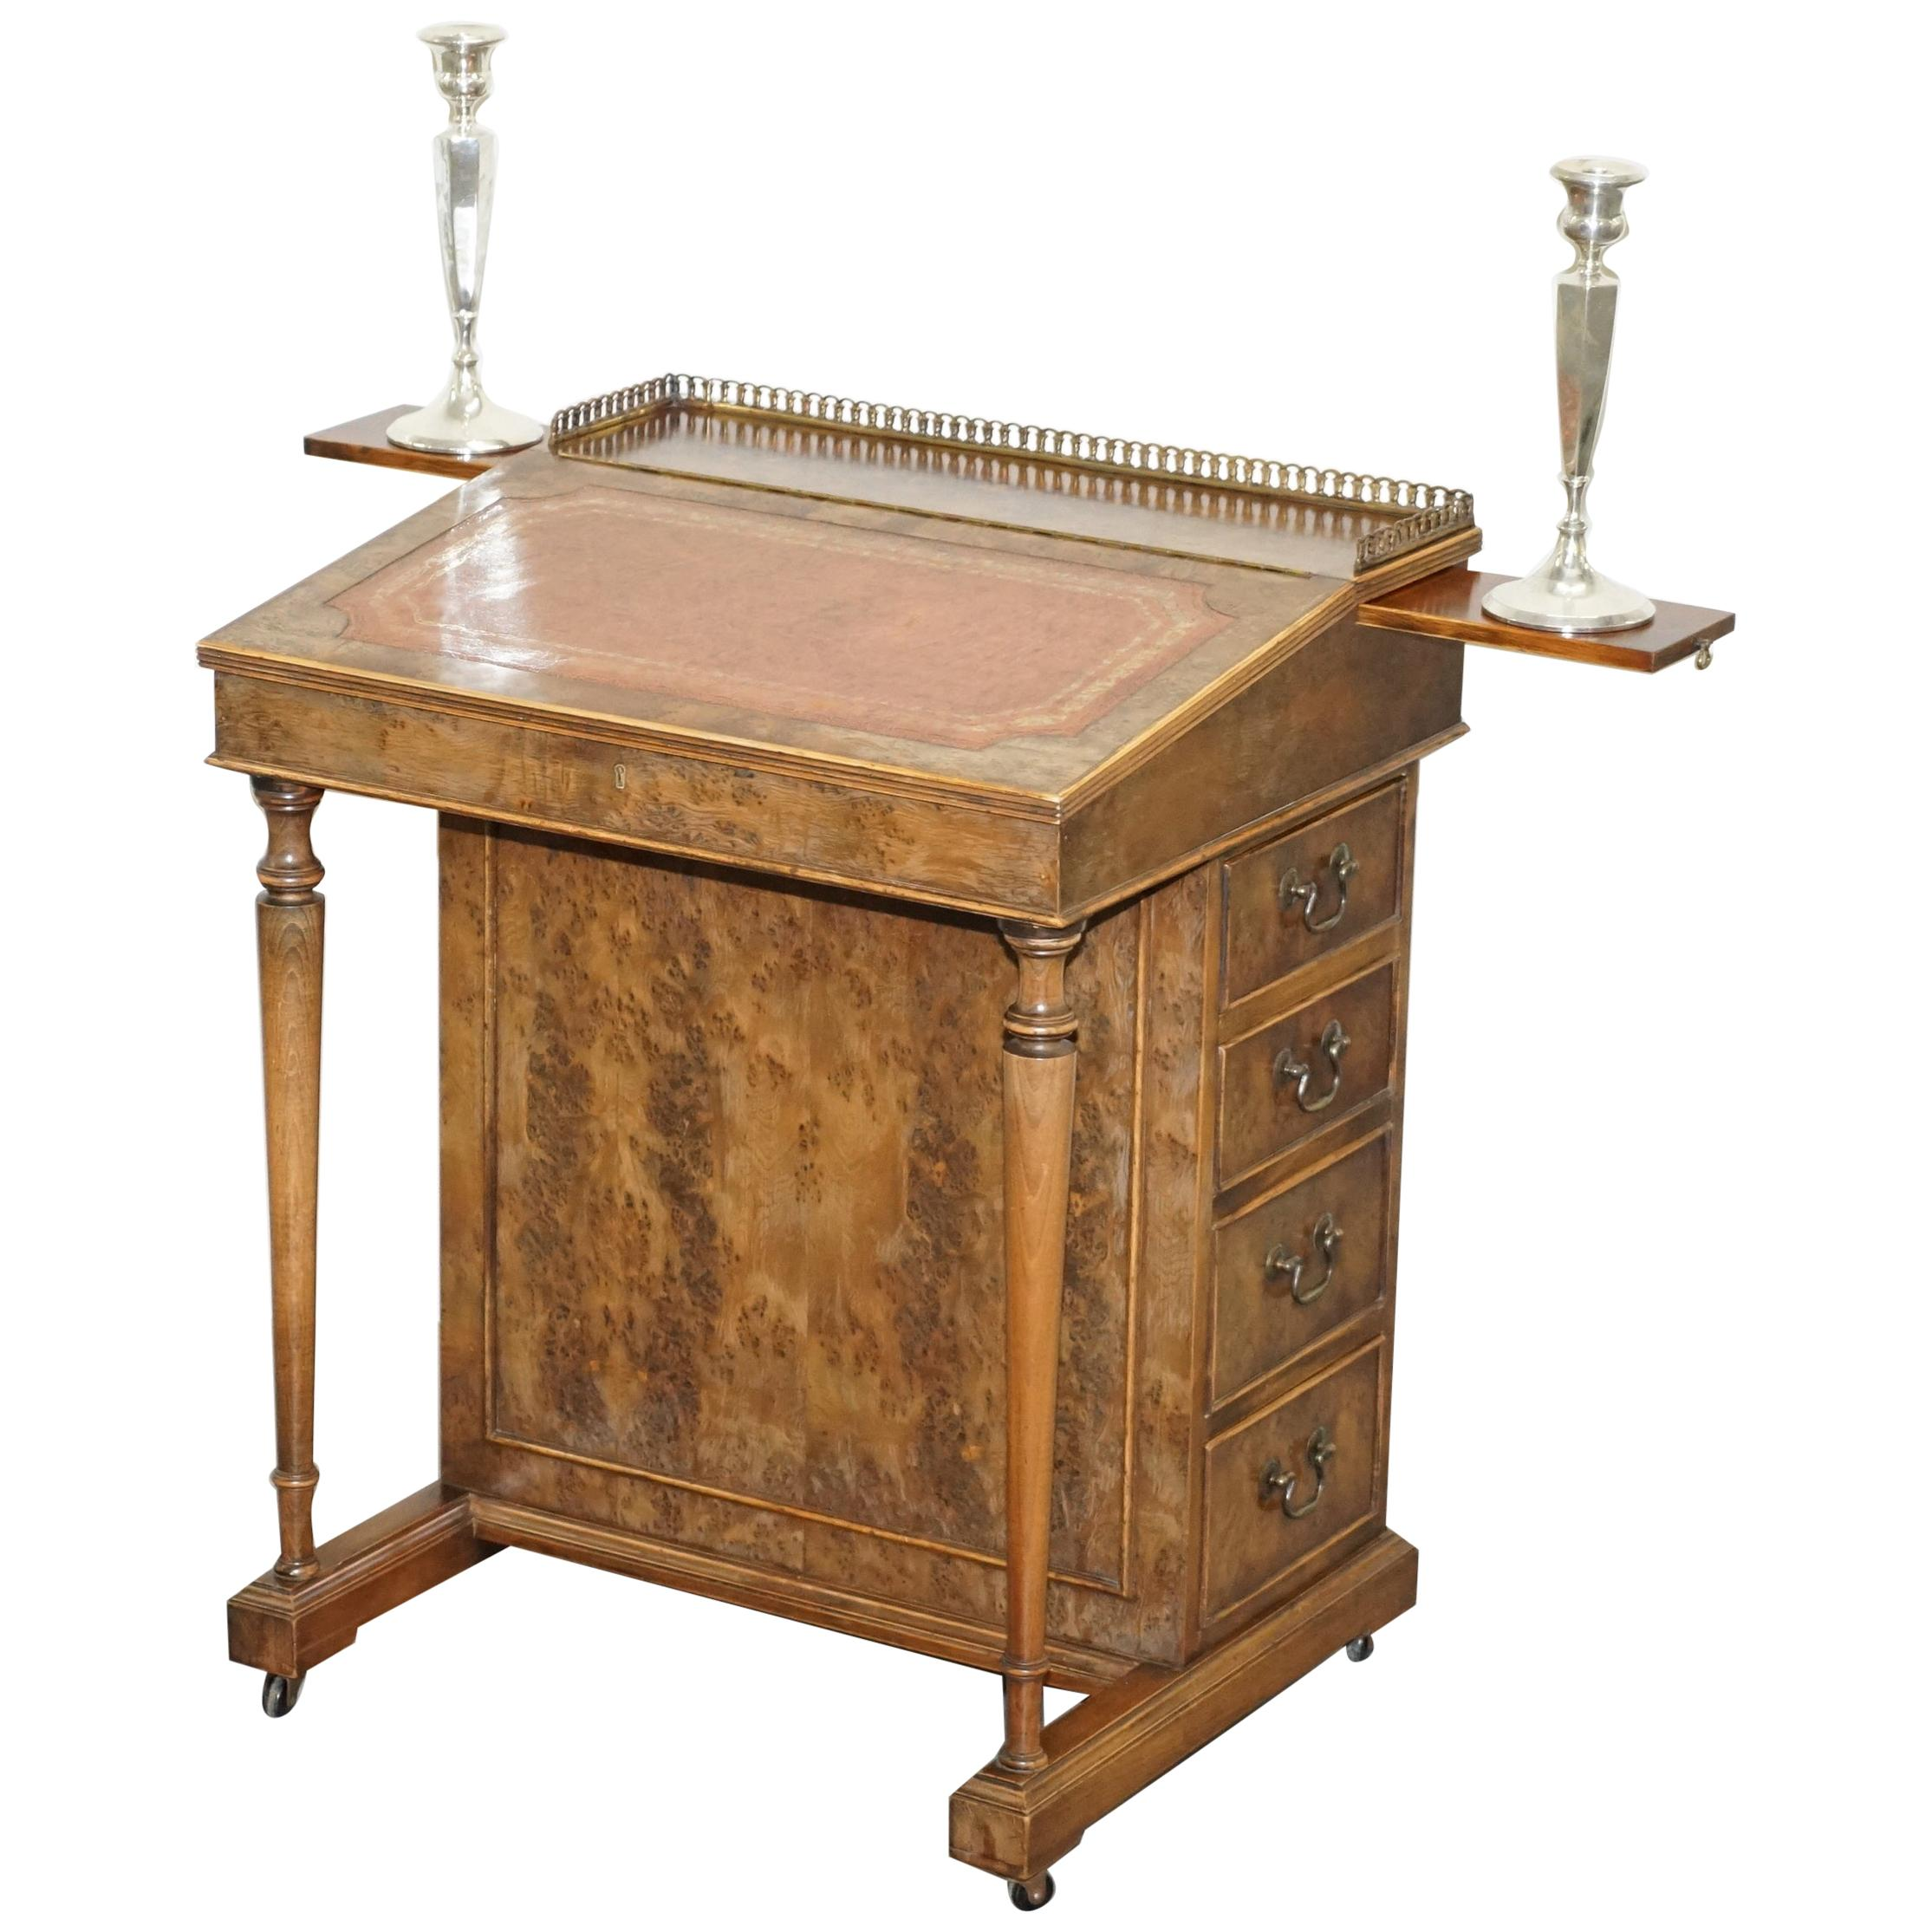 Vintage Burr Walnut, Leather and Brass Gallery Rail Davenport Desk Workstation